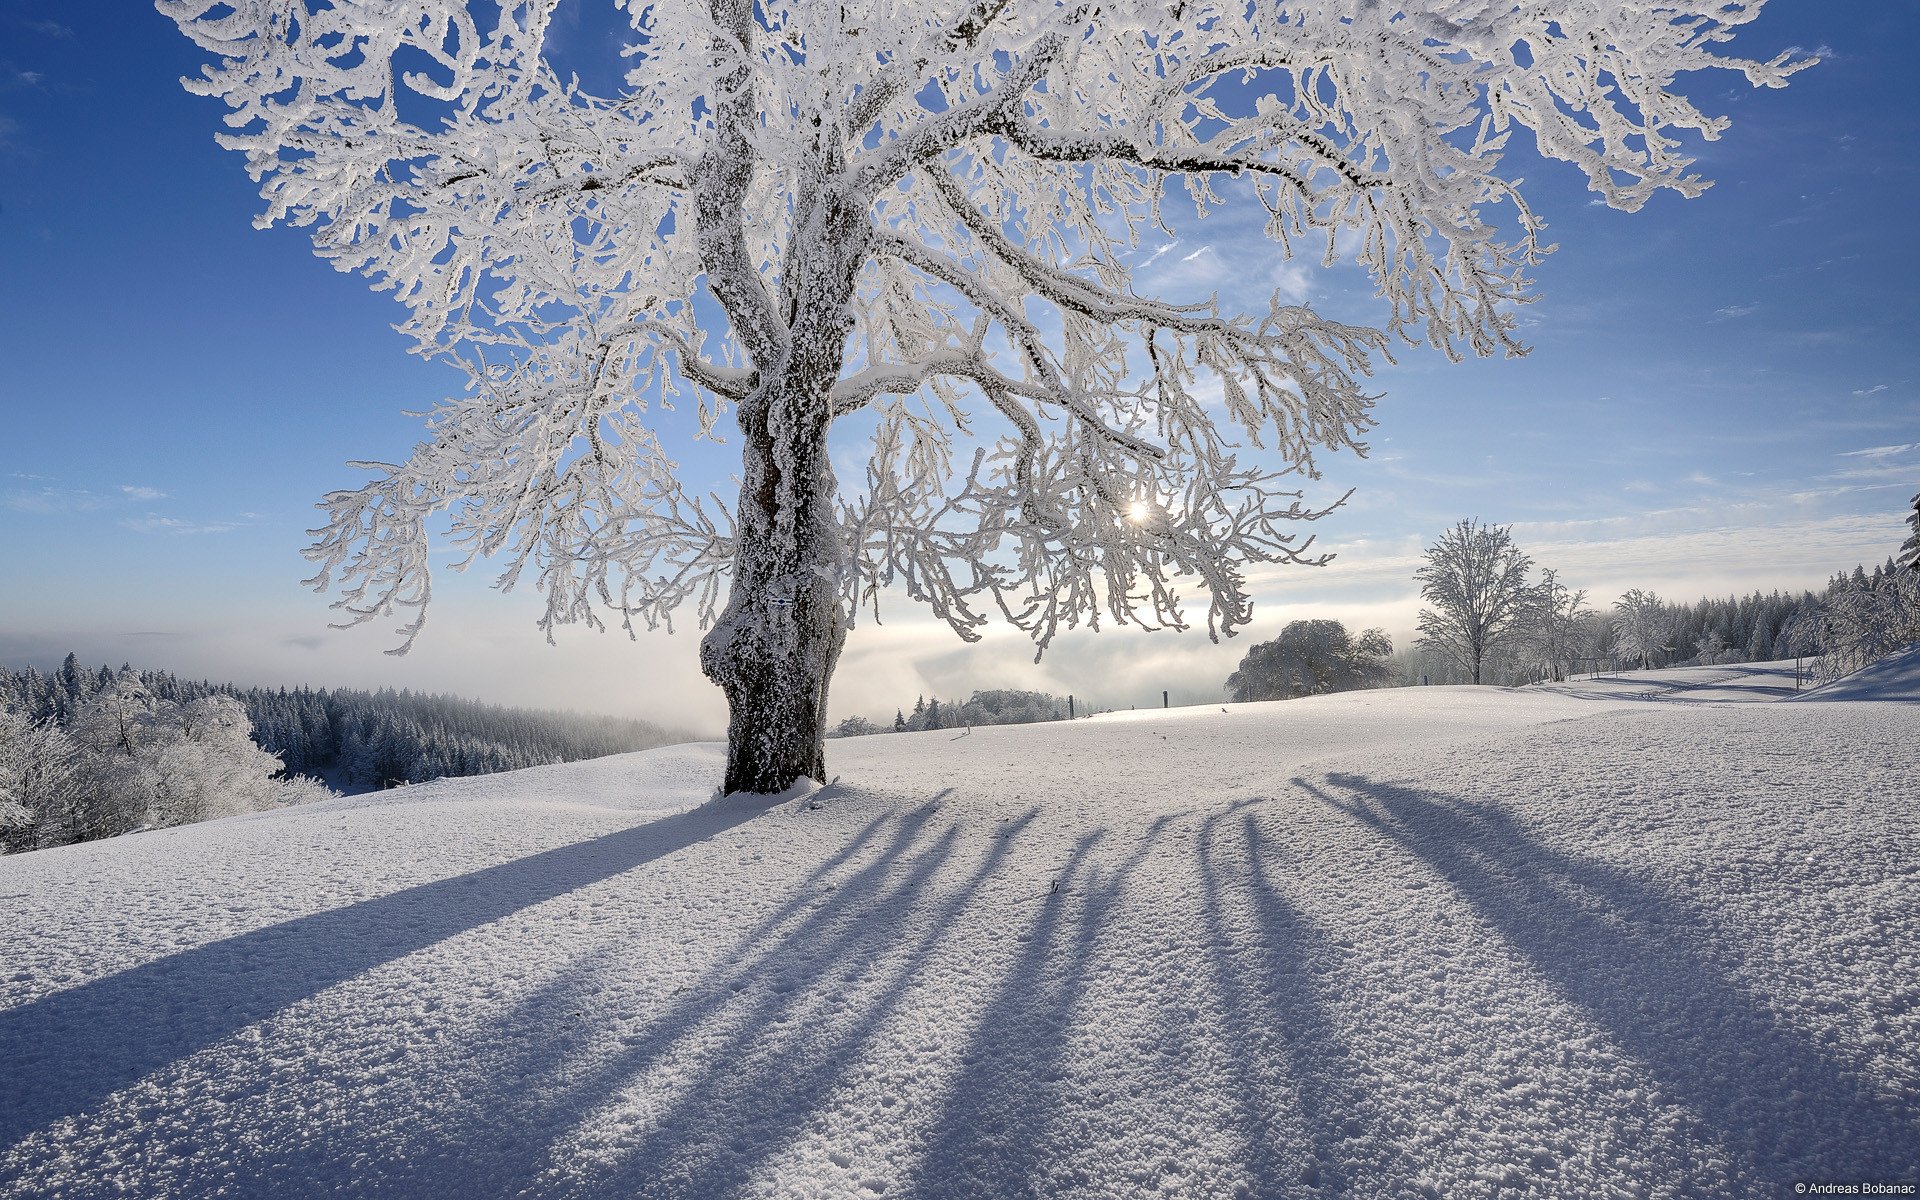 Winter Backgrounds For Desktop Wallpapers) – Adorable Wallpapers